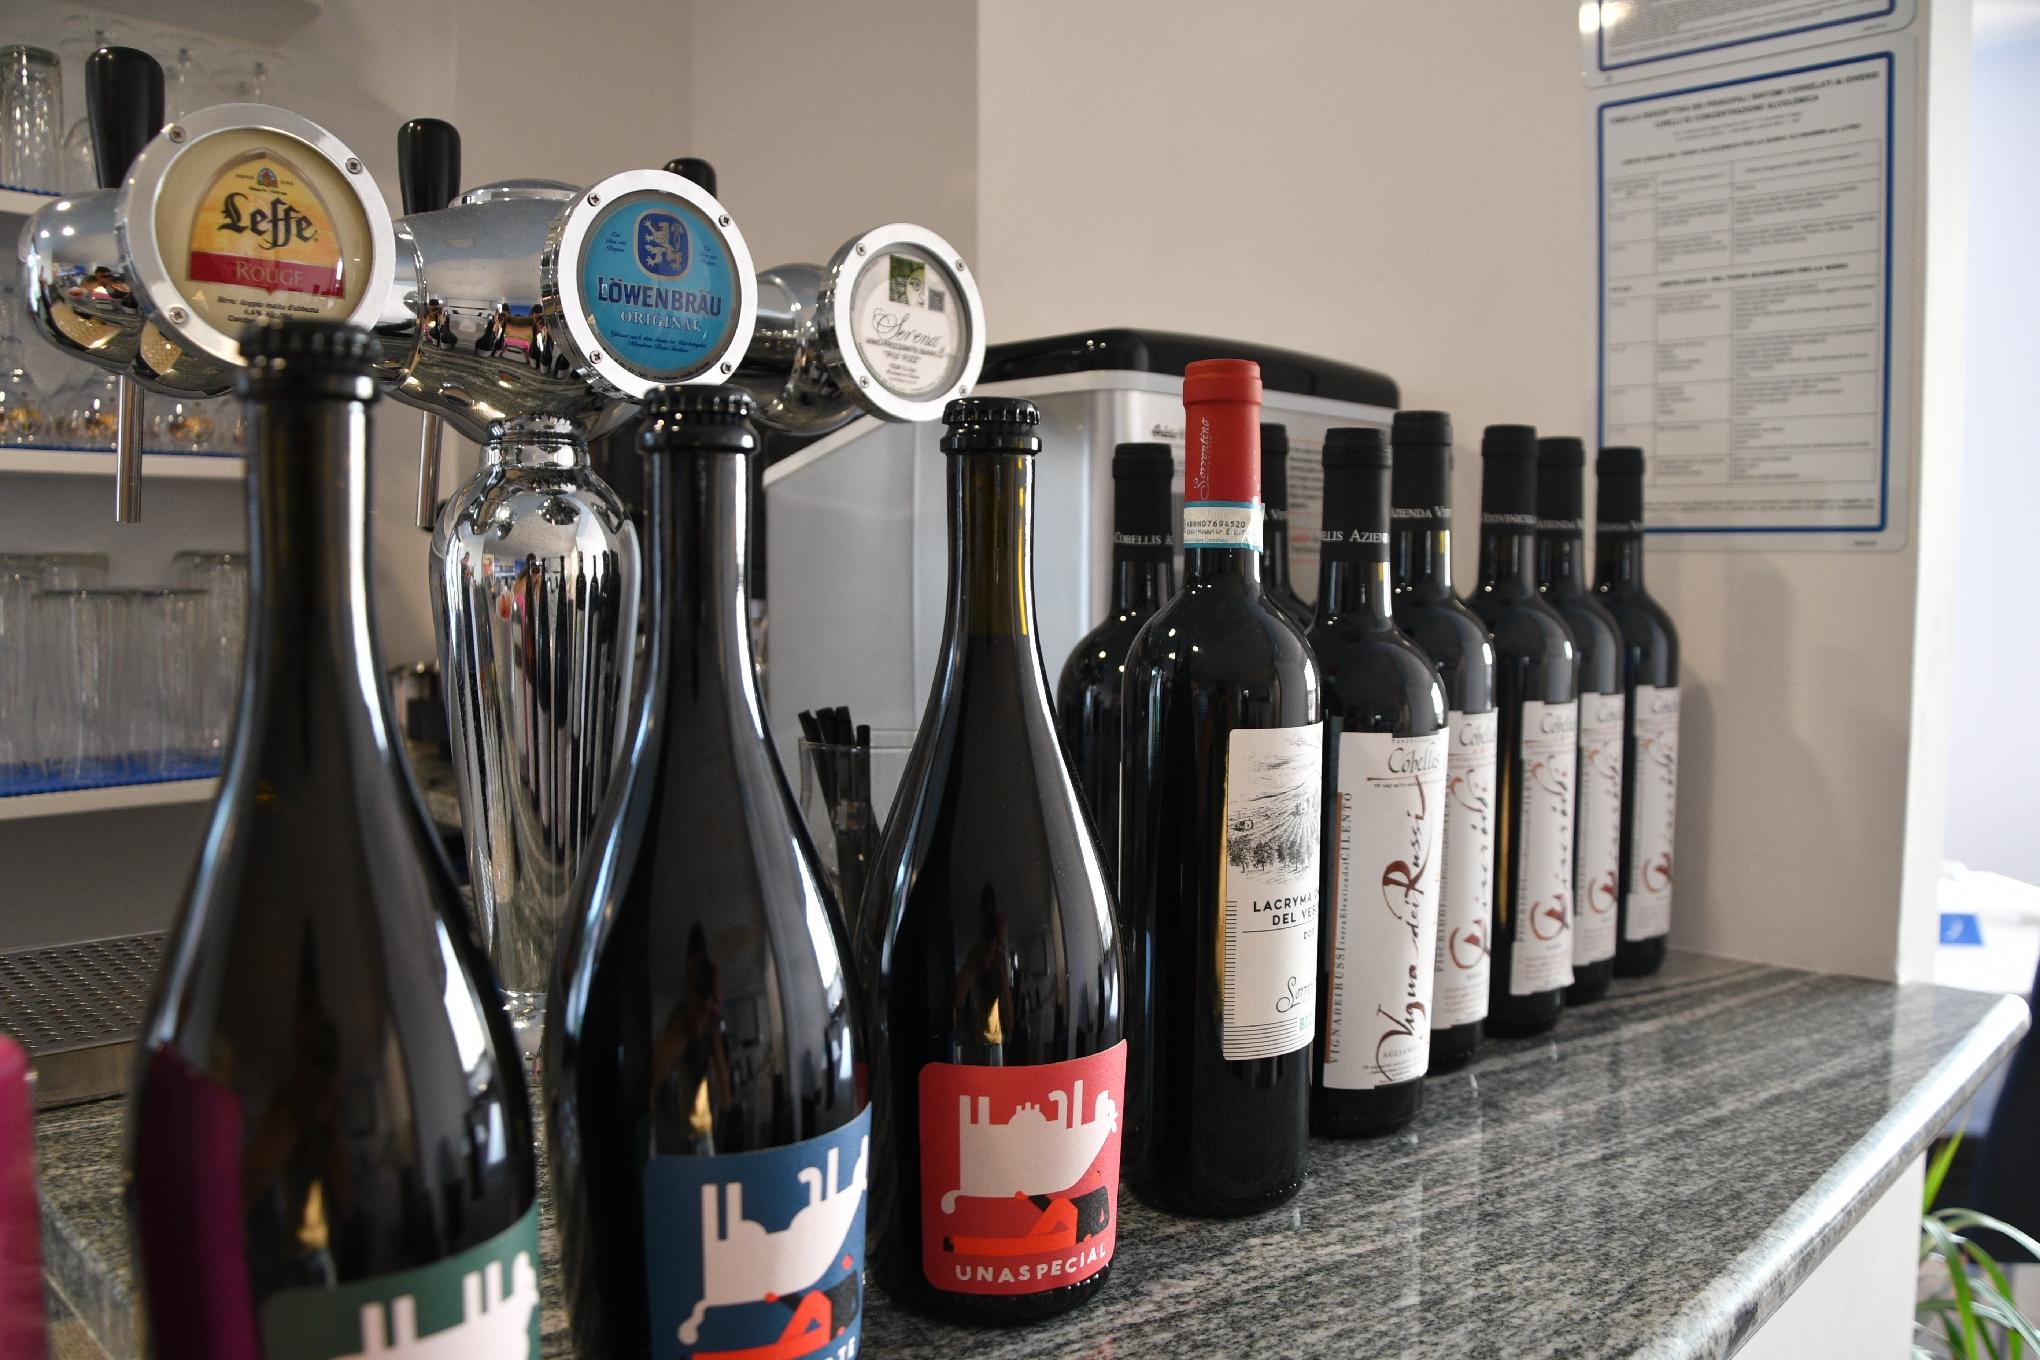 Bar: Vino Birra - Hotel Indaco Hotel Ristorante Pizzeria Casal Velino Marina (Salerno) Cilento